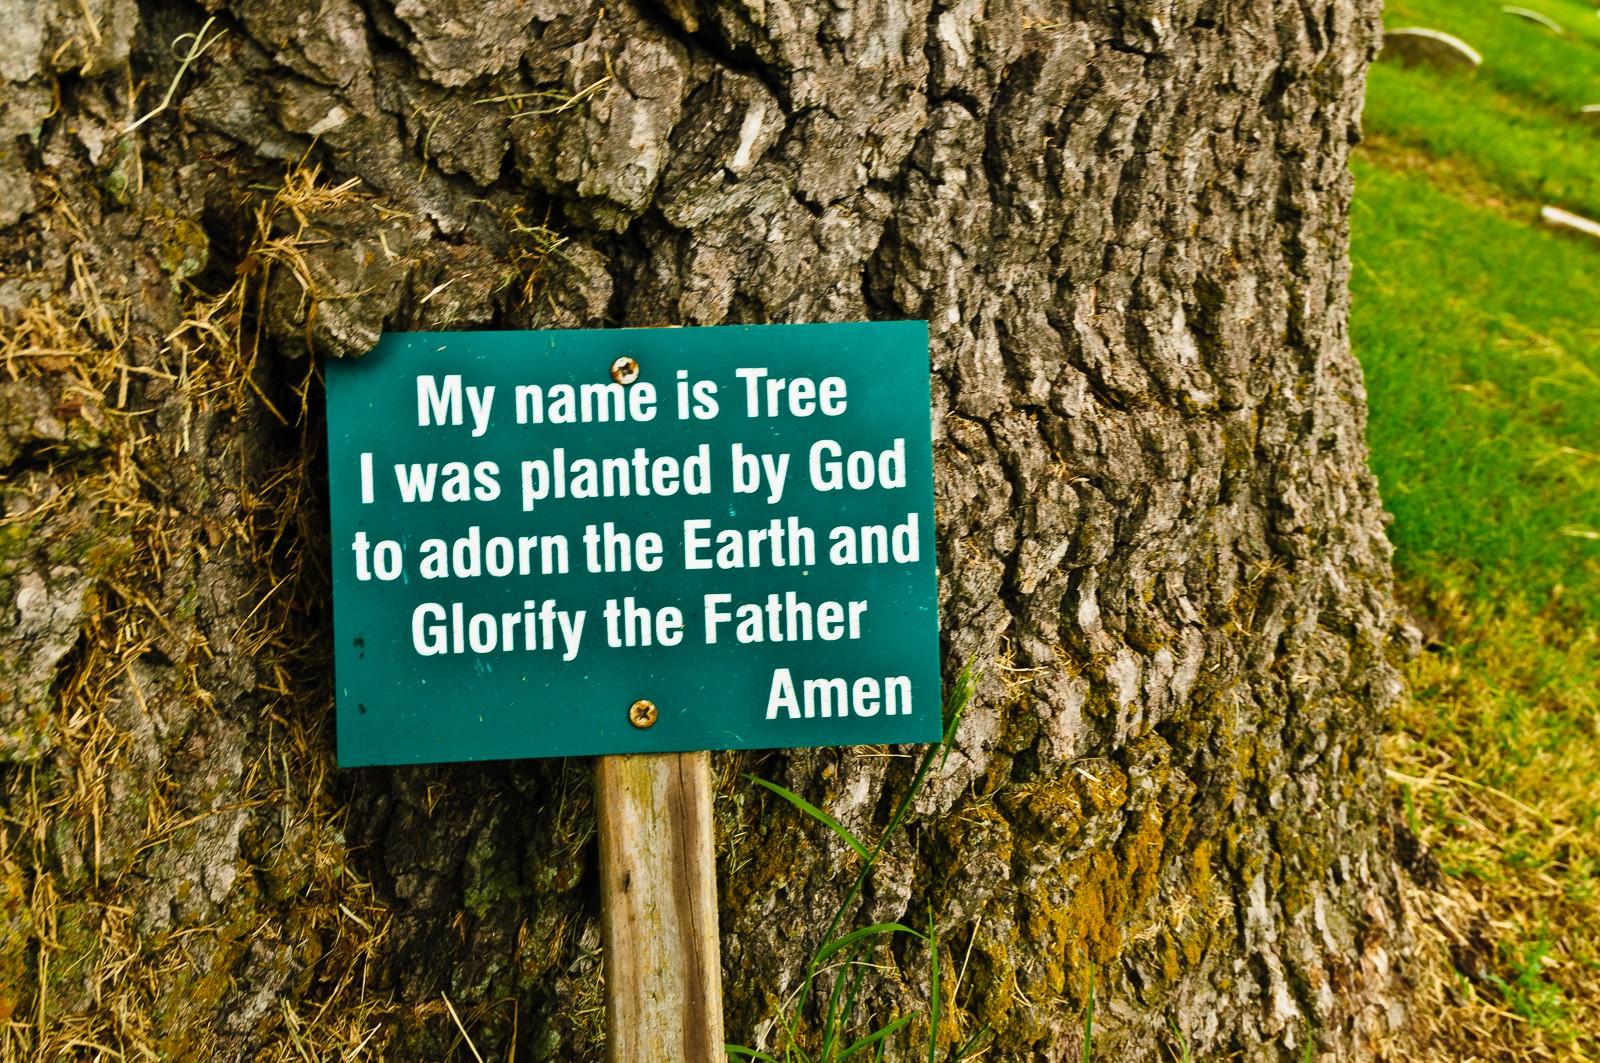 god-salem-oak-tree-1570